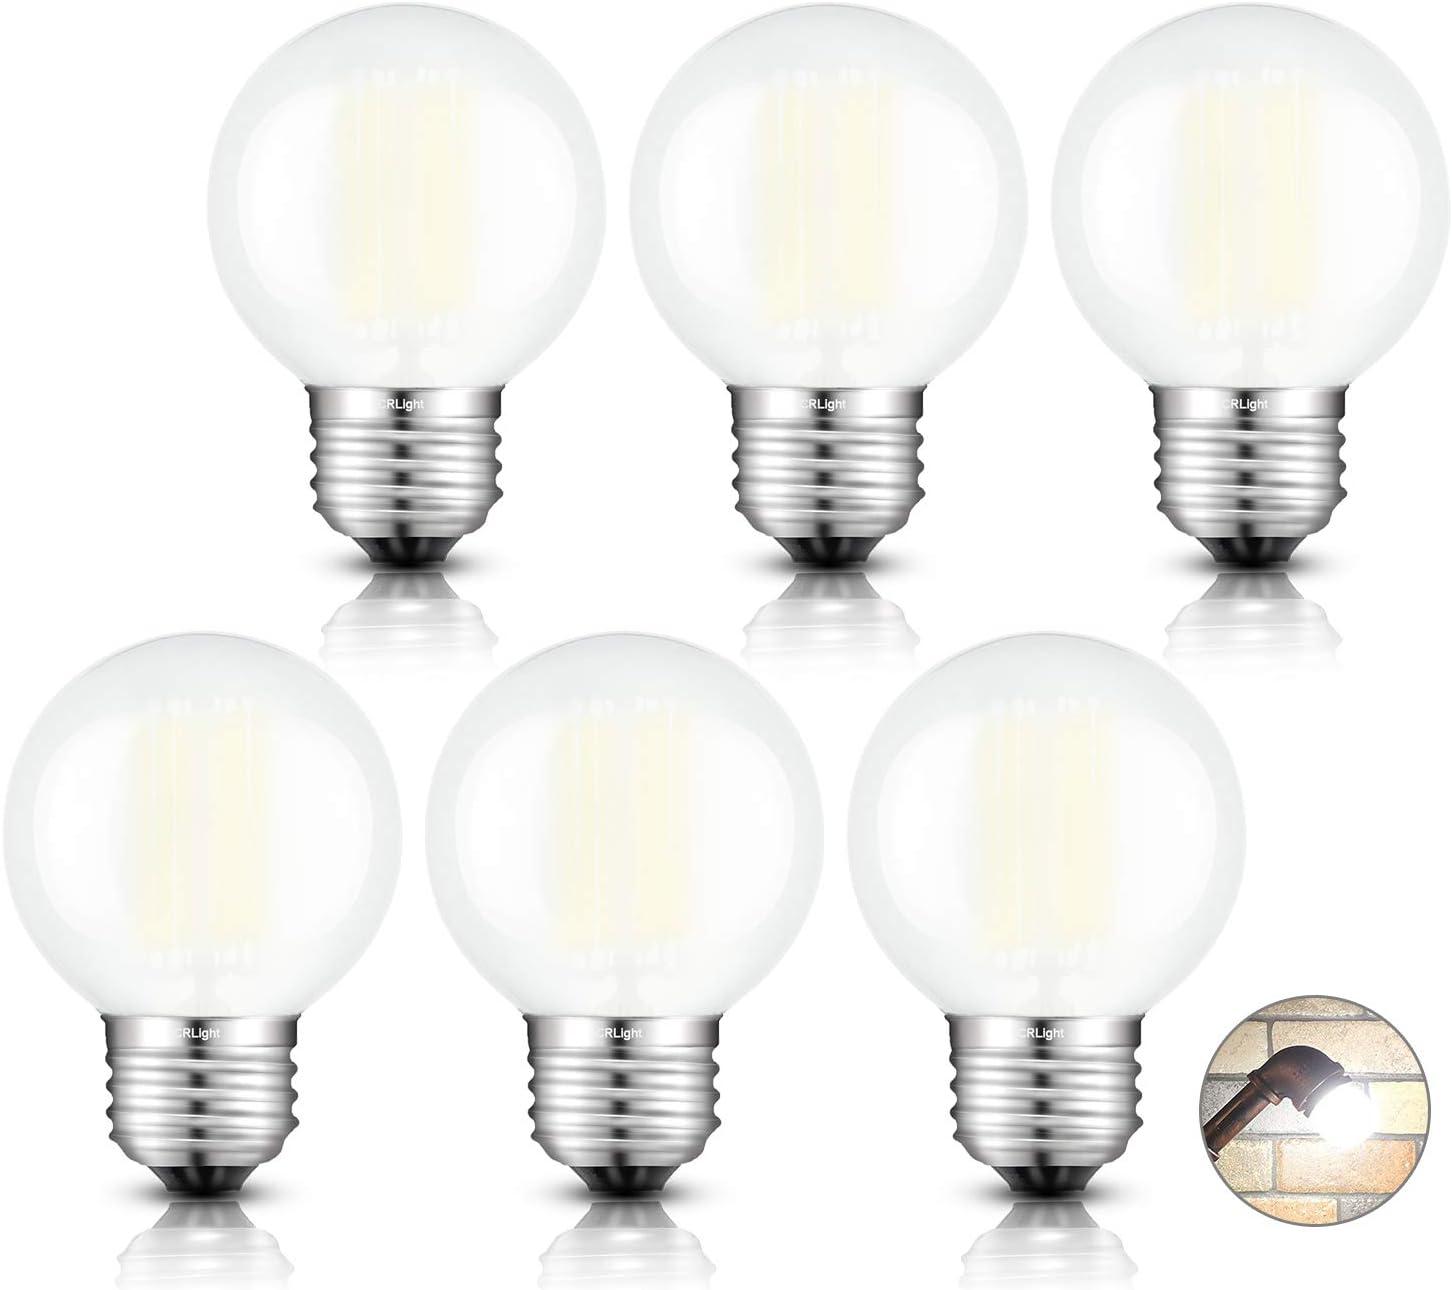 CRLight 6W Edison LED Globe Bulb 4000K Daylight White, 65W Equivalent 650 Lumens Dimmable, E26 Base Vintage Style G16 Globe Frosted Glass Ceiling Fan Bathroom Vanity LED Filament Light Bulbs, 6 Pack